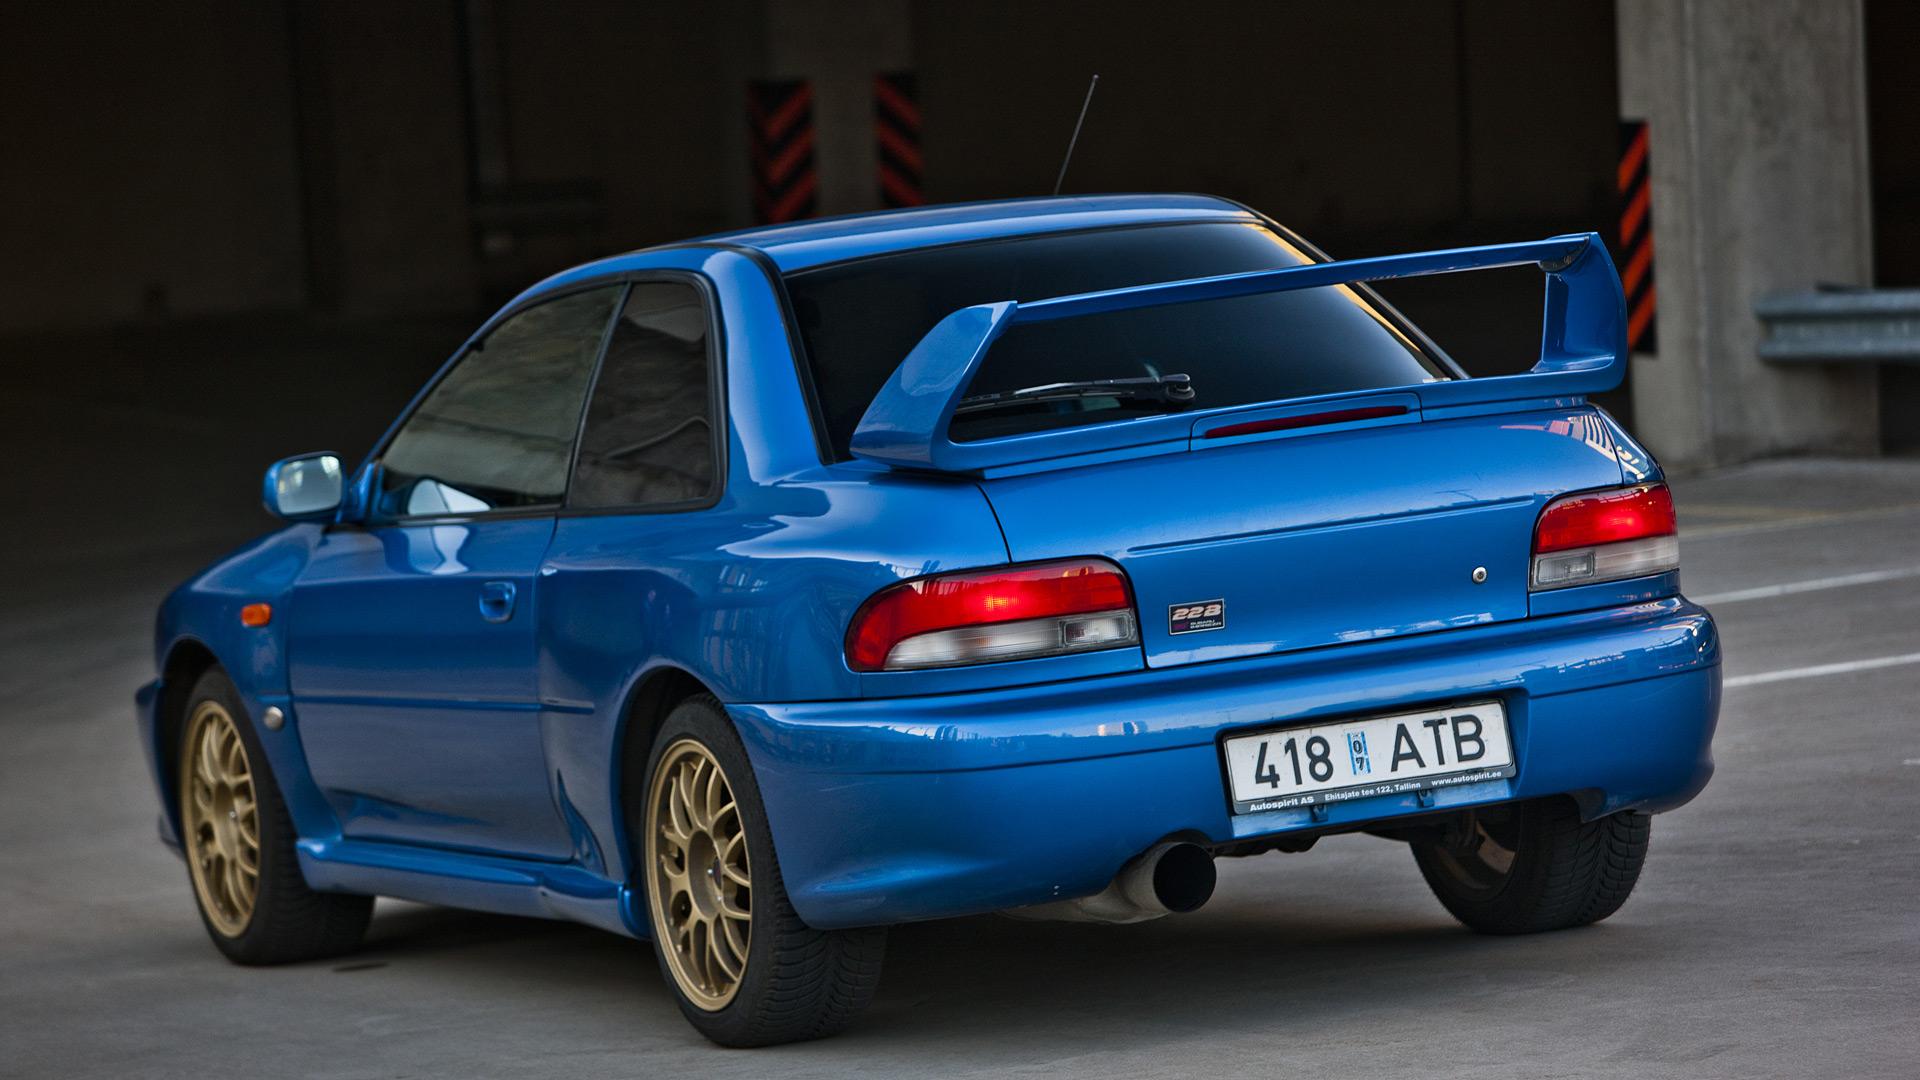 1998-Subaru-Impreza-22B-STI-V5-1080.jpg